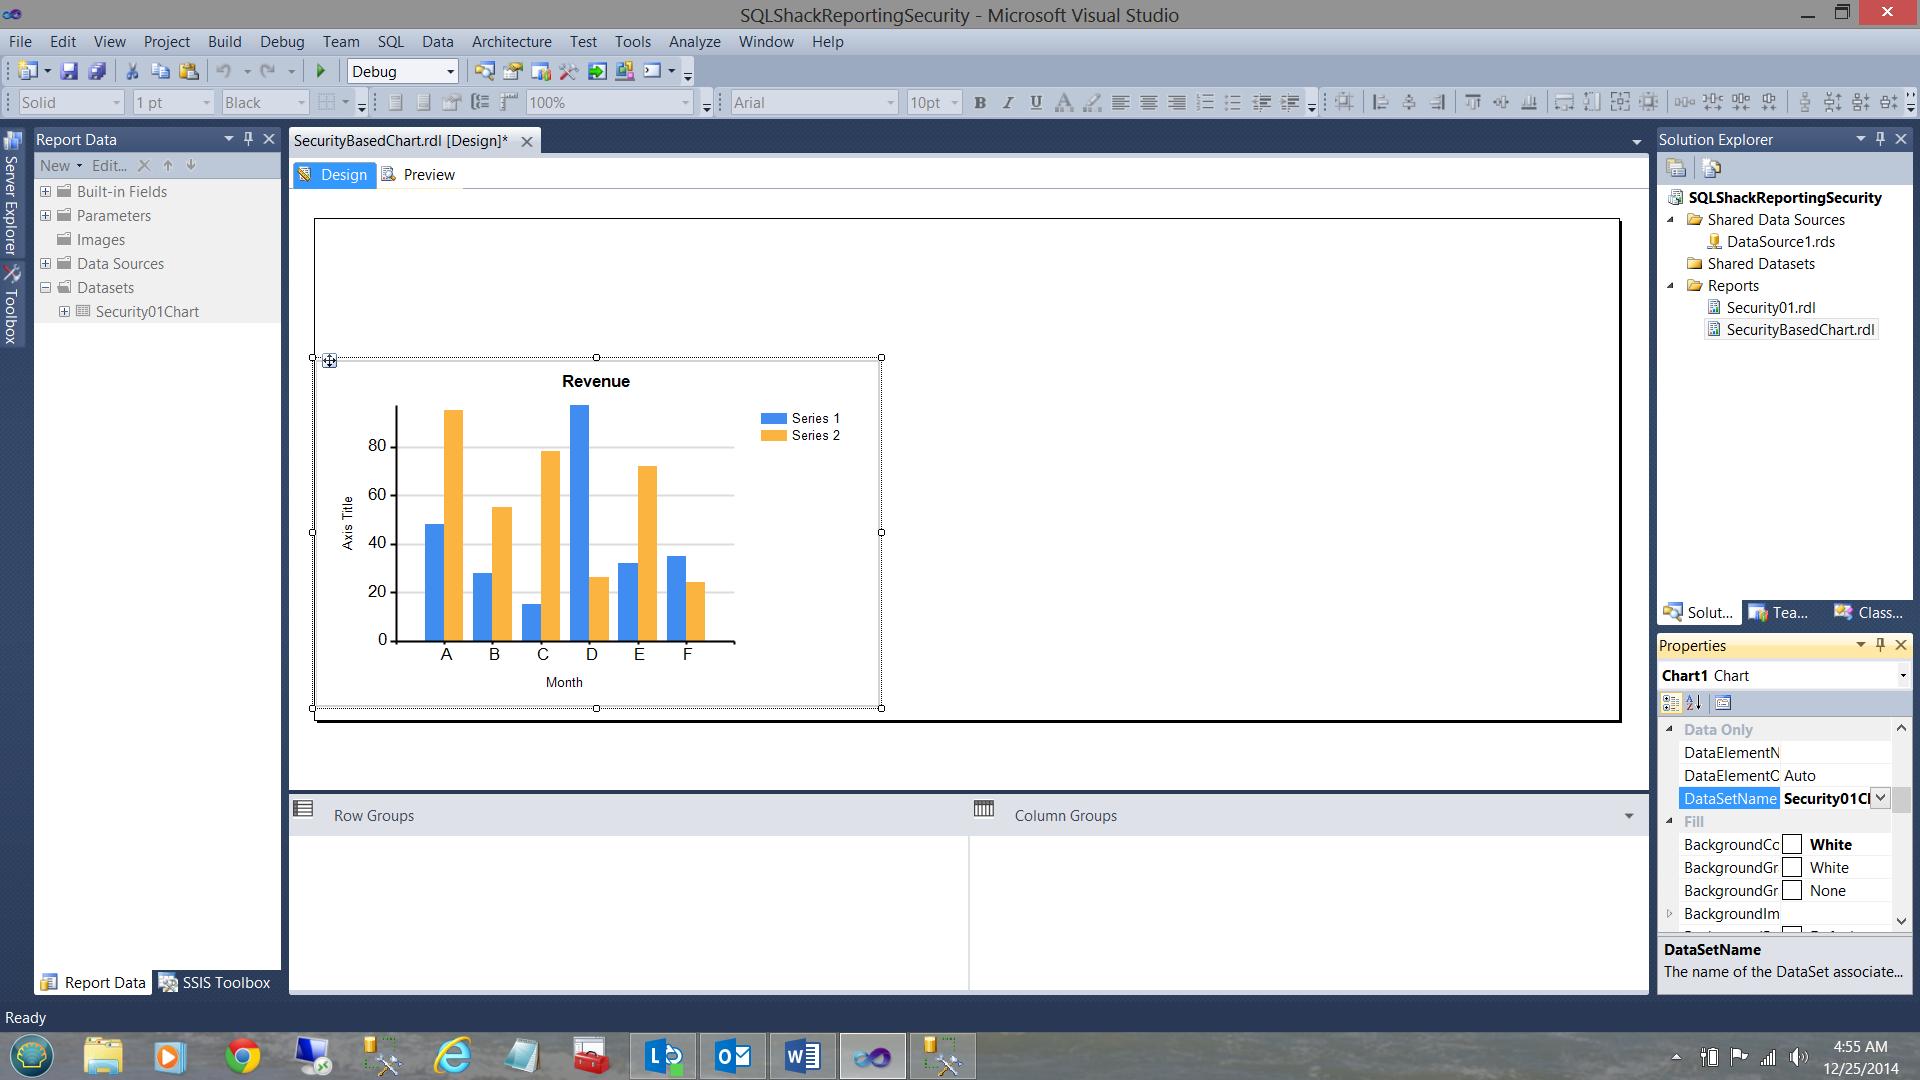 SQL Server安全机制–如何控制用户能够在报告中查看哪些数据22